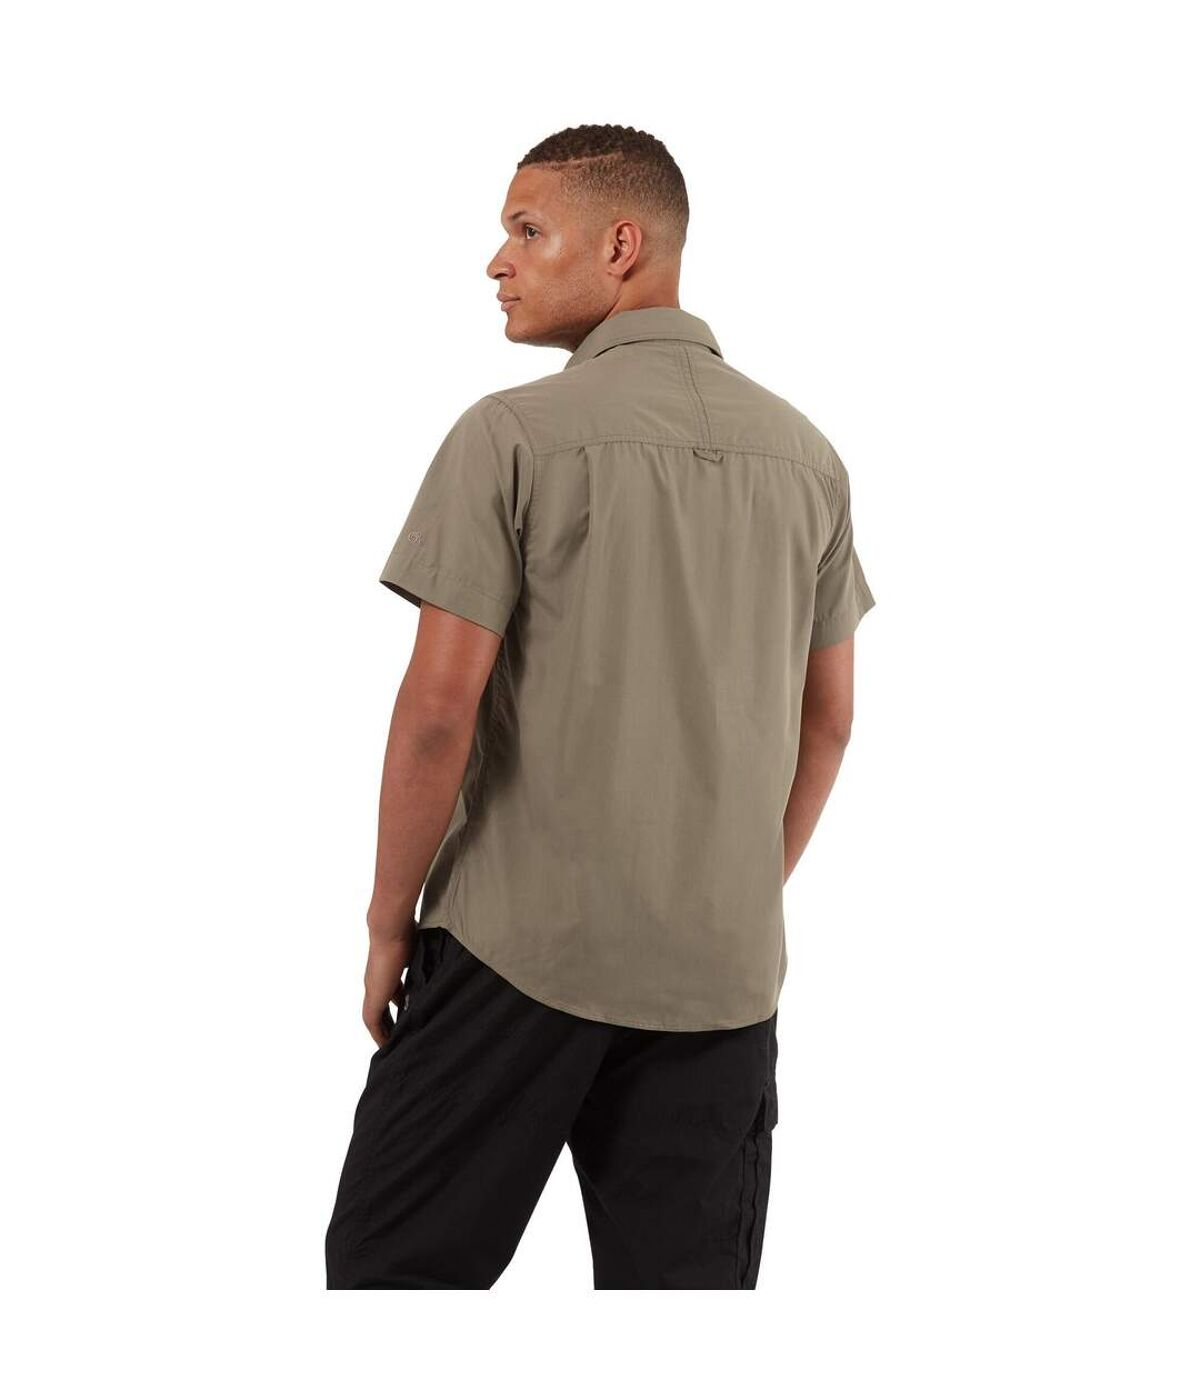 Craghoppers Outdoor Classic Mens Kiwi Short Sleeve Shirt (Pebble) - UTCG181